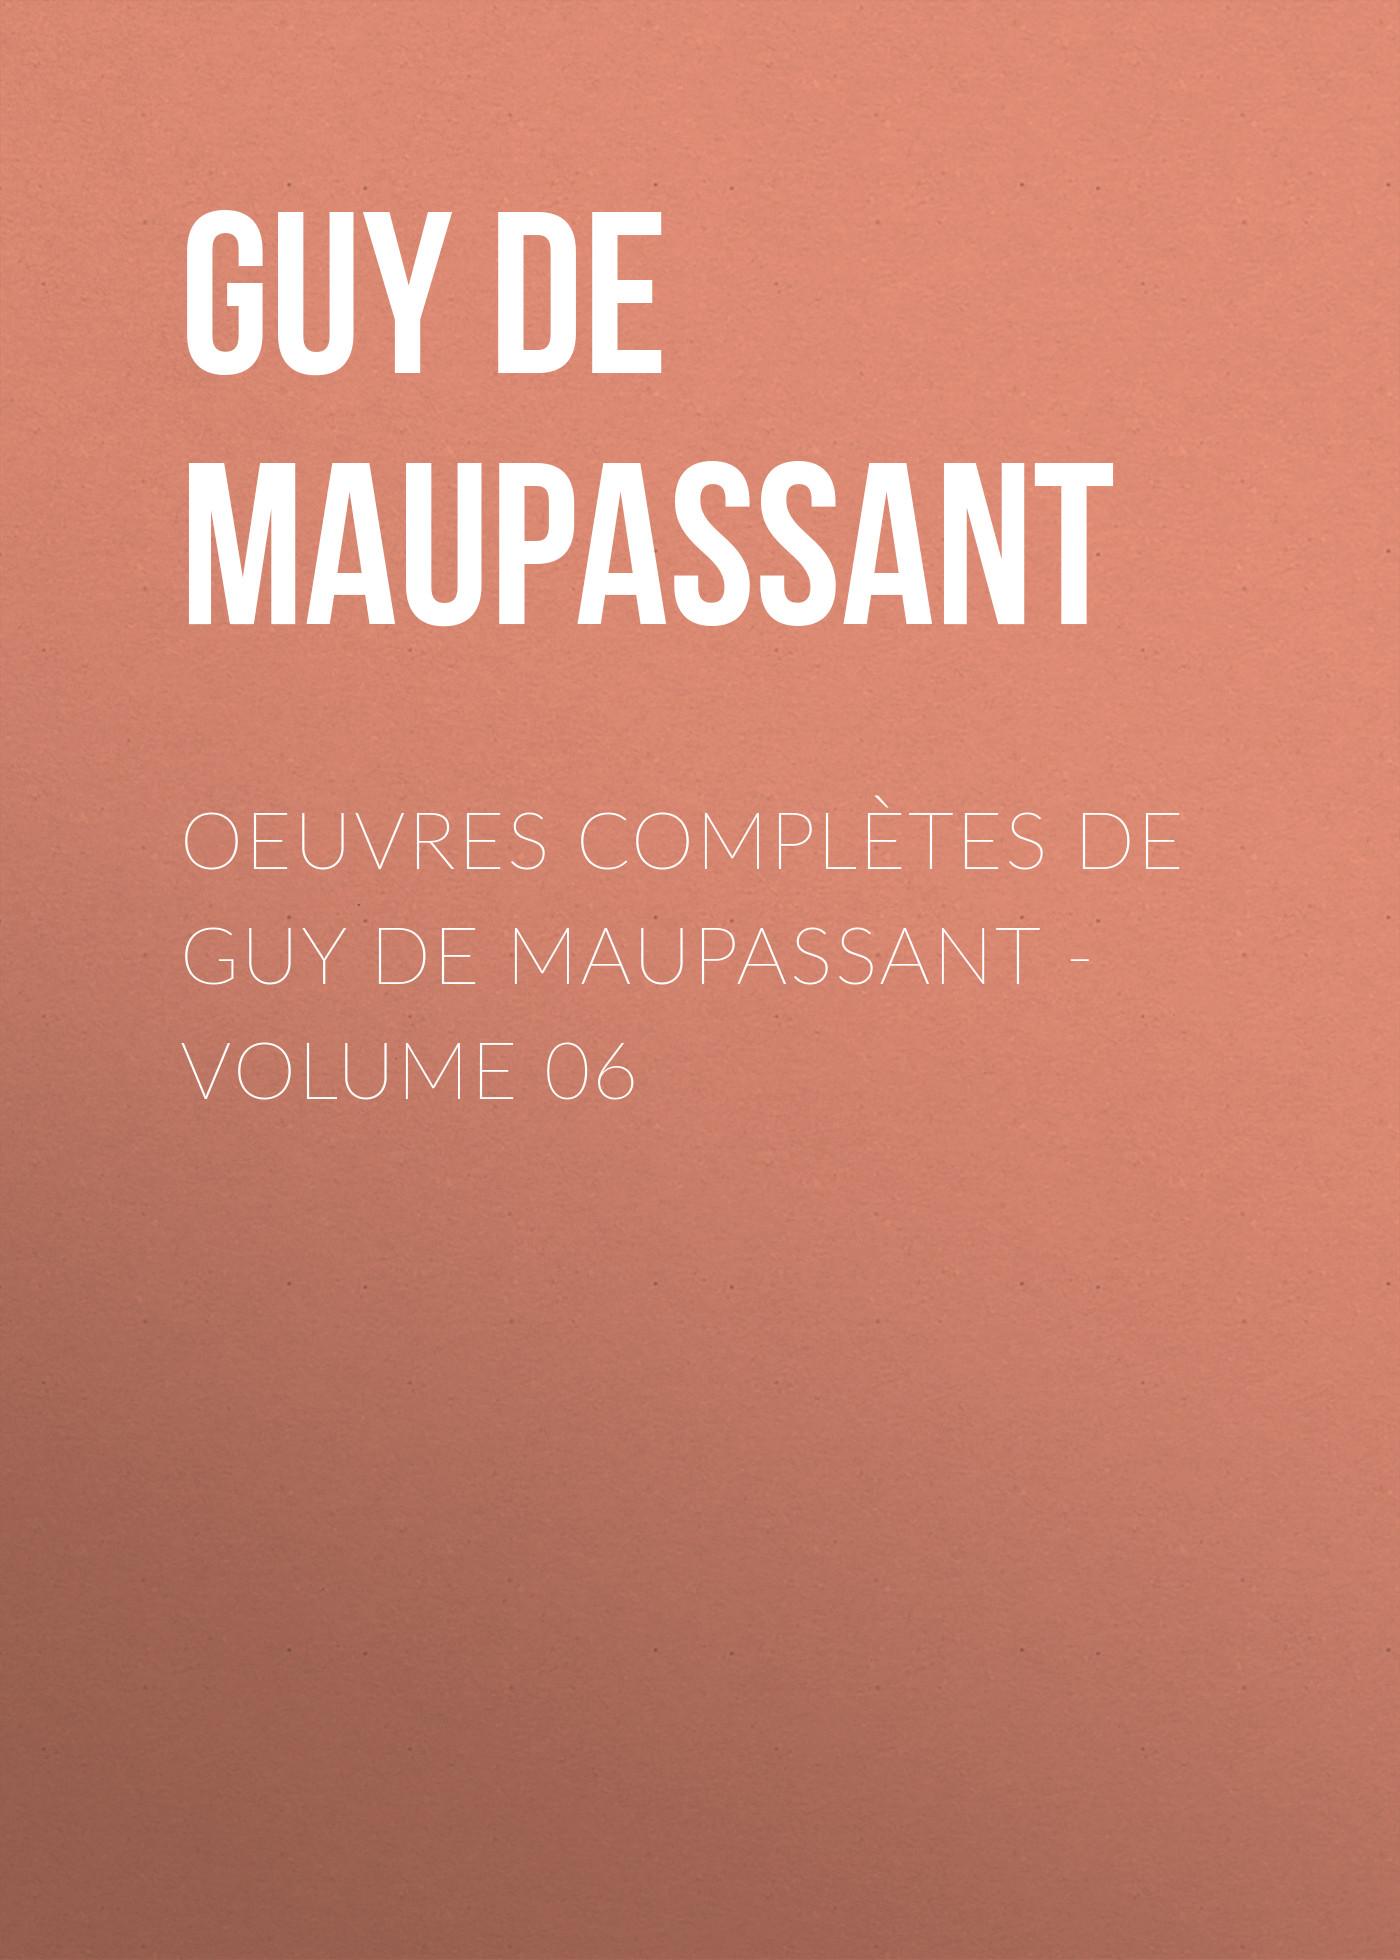 Ги де Мопассан OEuvres complètes de Guy de Maupassant - volume 06 ги де мопассан œuvres complètes de guy de maupassant volume 03